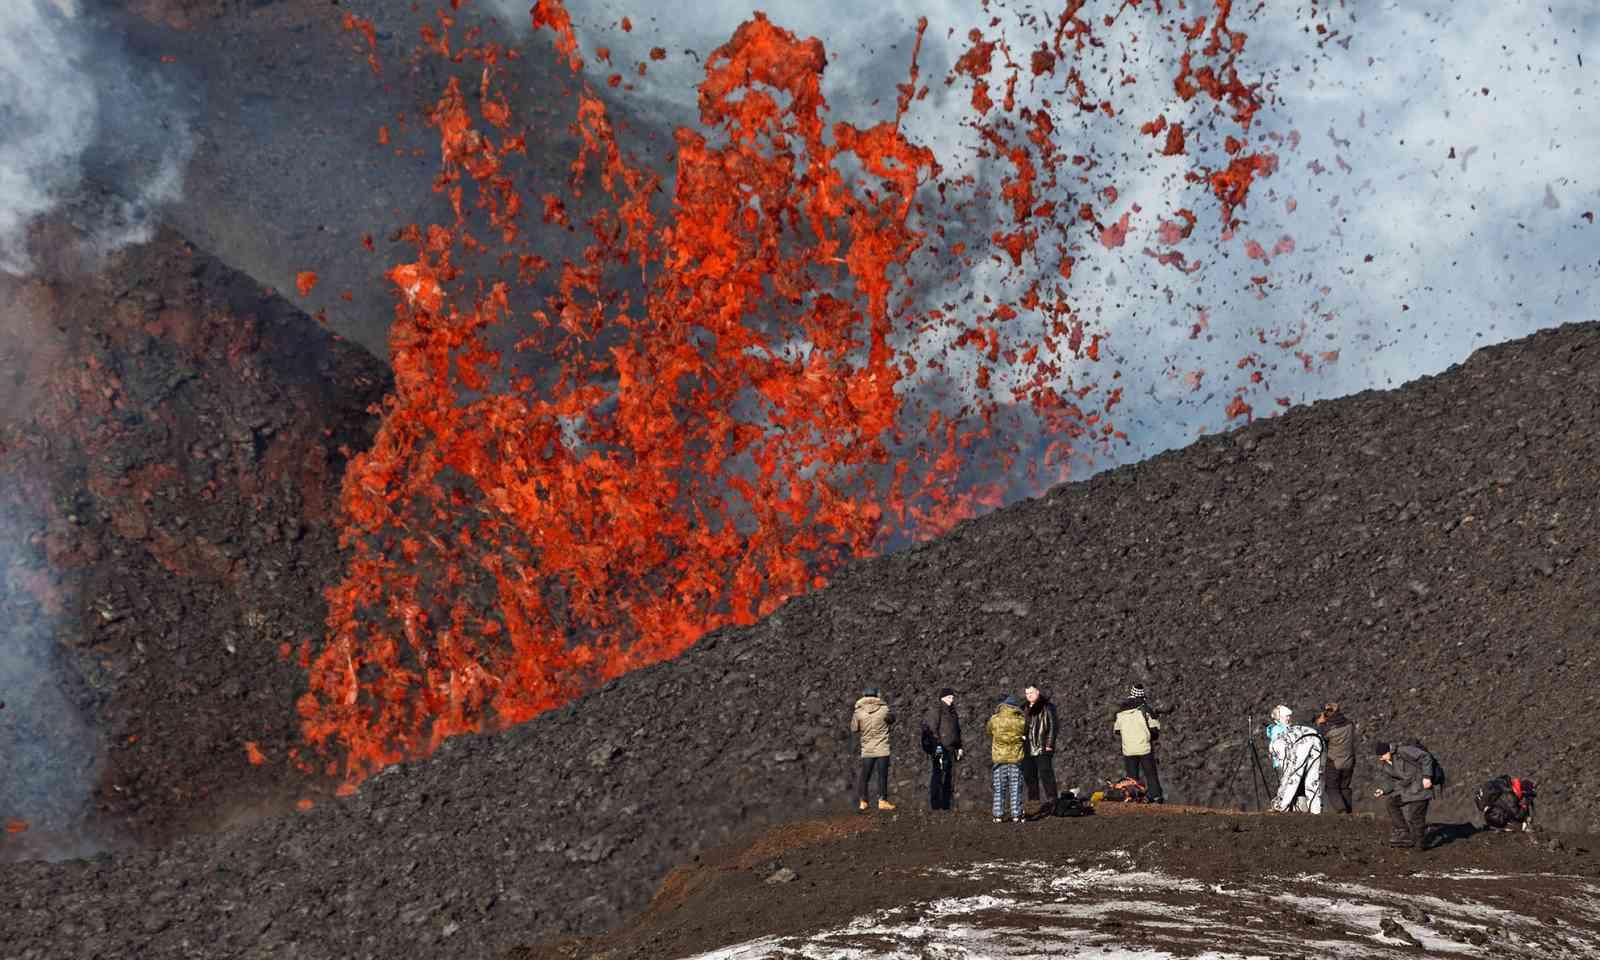 Volcano erupting on Kamchatka peninsula (Shutterstock.com)